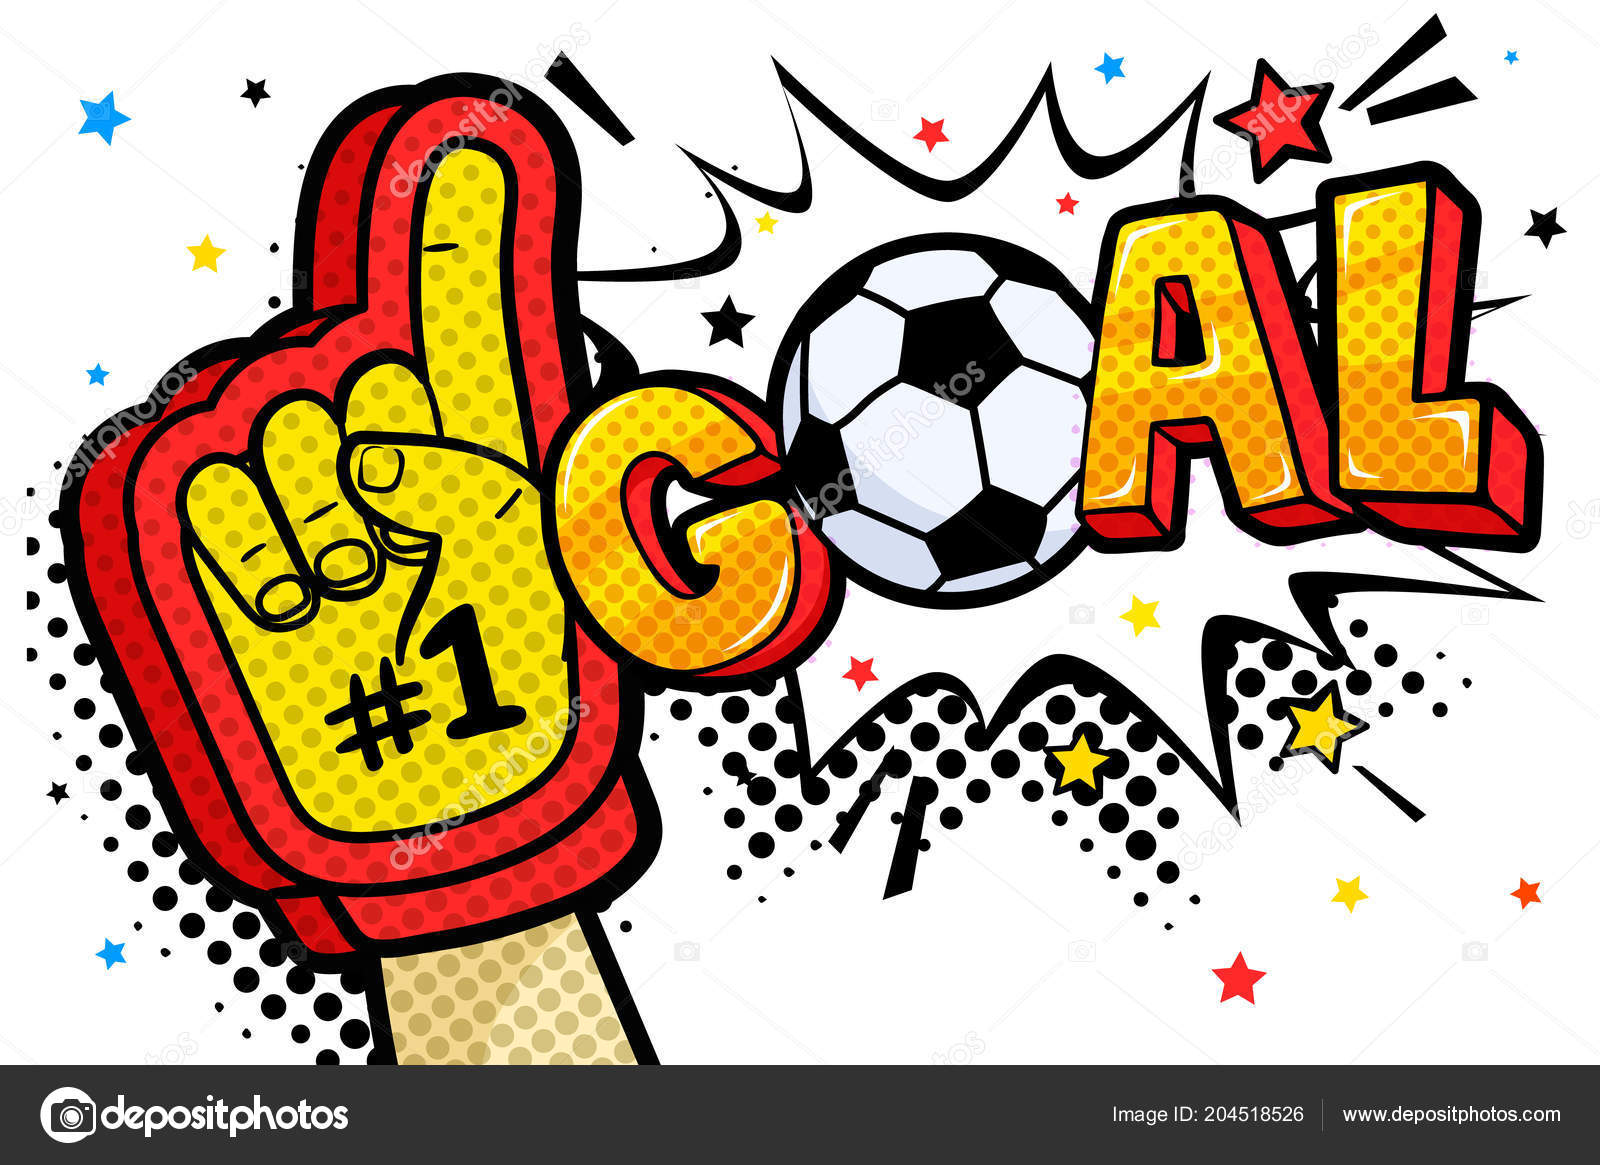 Hand Glove Sports Fan Raised Celebrating Win Goal Word